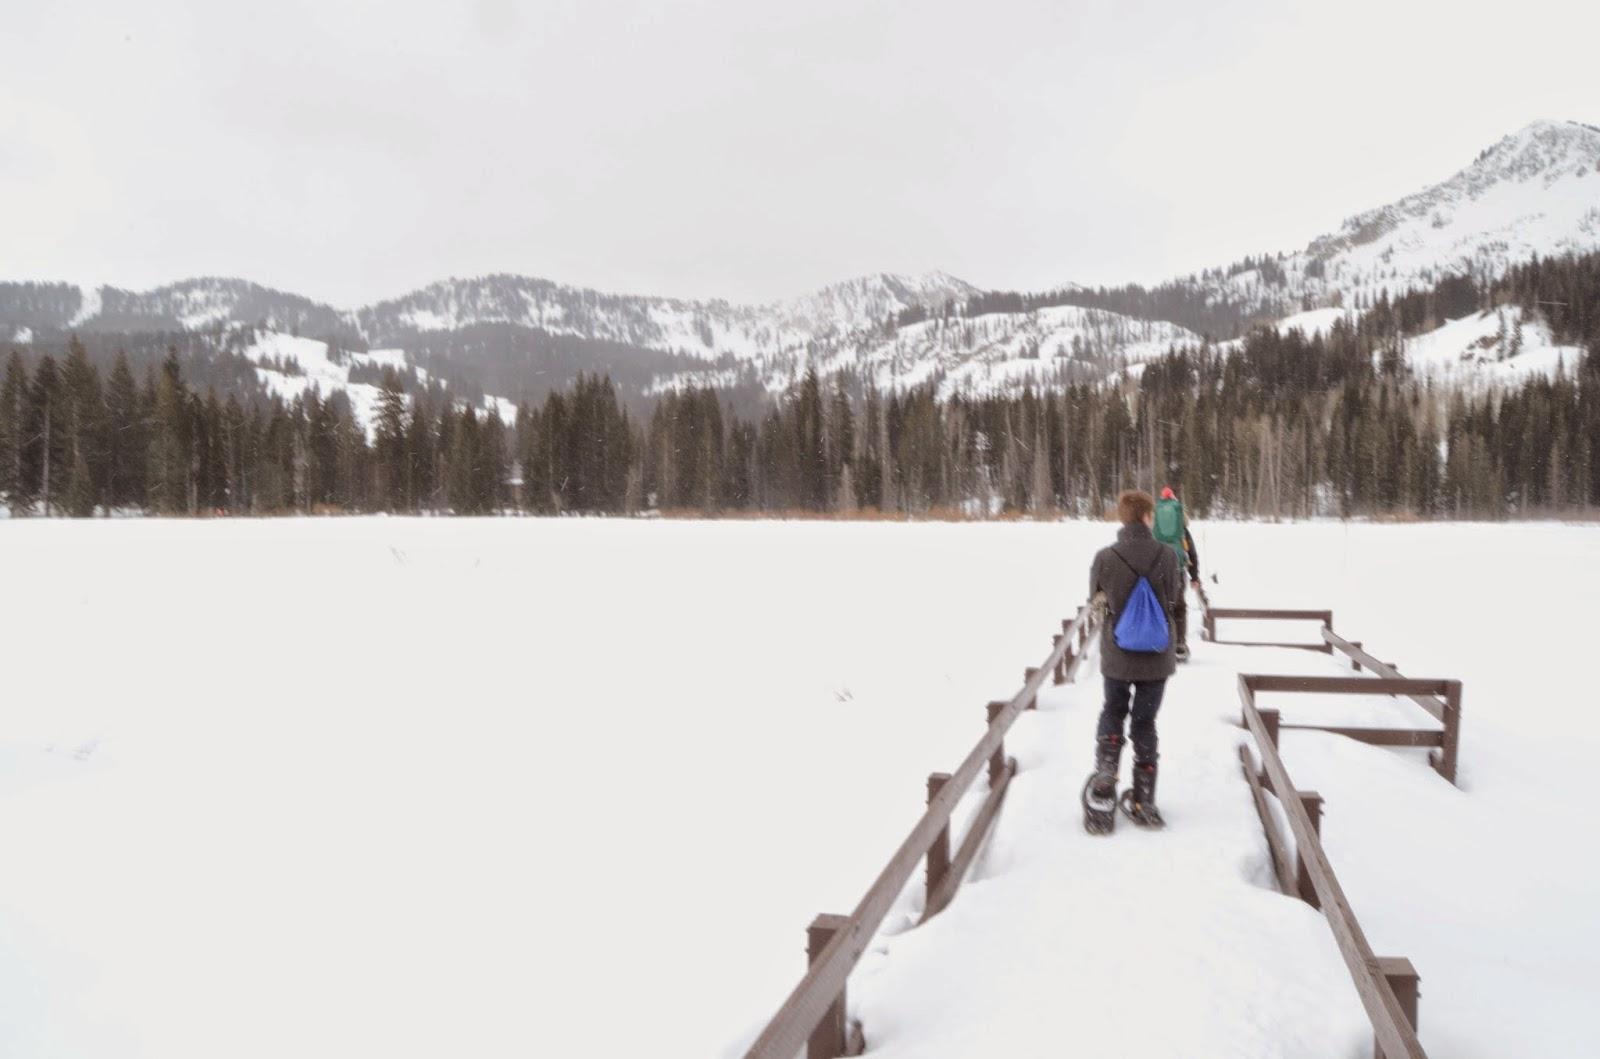 Snowshoeing at Solitude Nordic Center